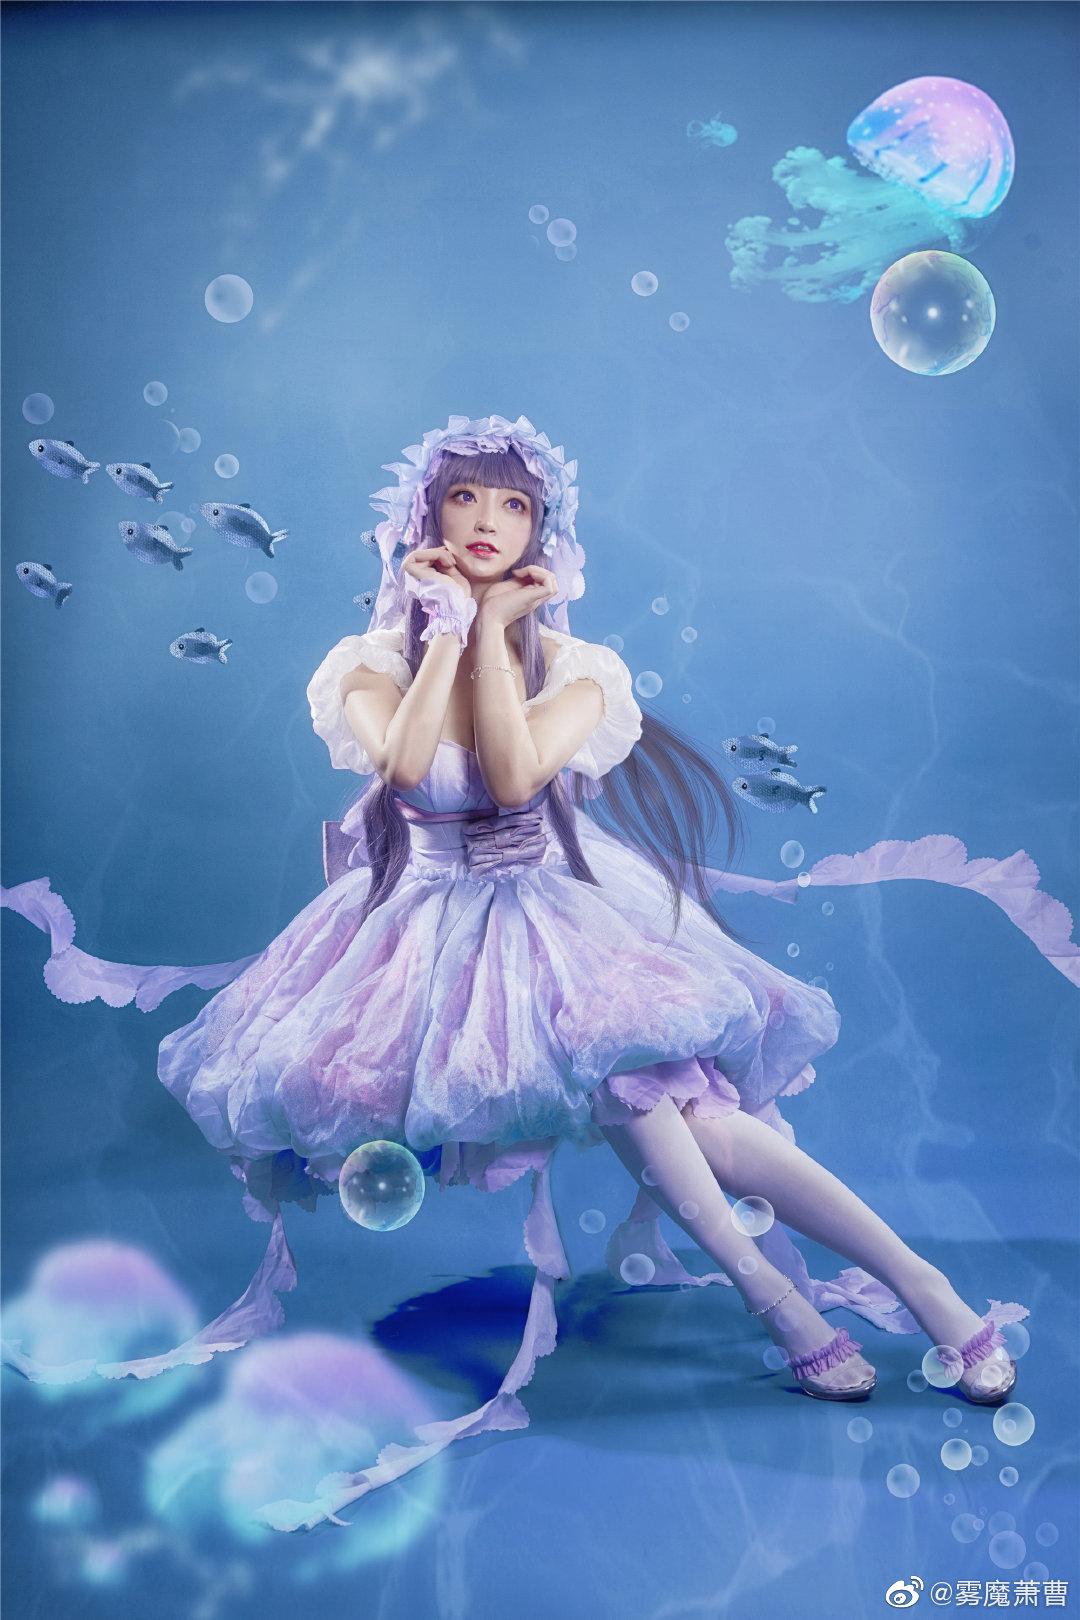 [COS]#魔卡少女樱# 大道寺知世 - 水之轮舞曲 COSPLAY-第5张